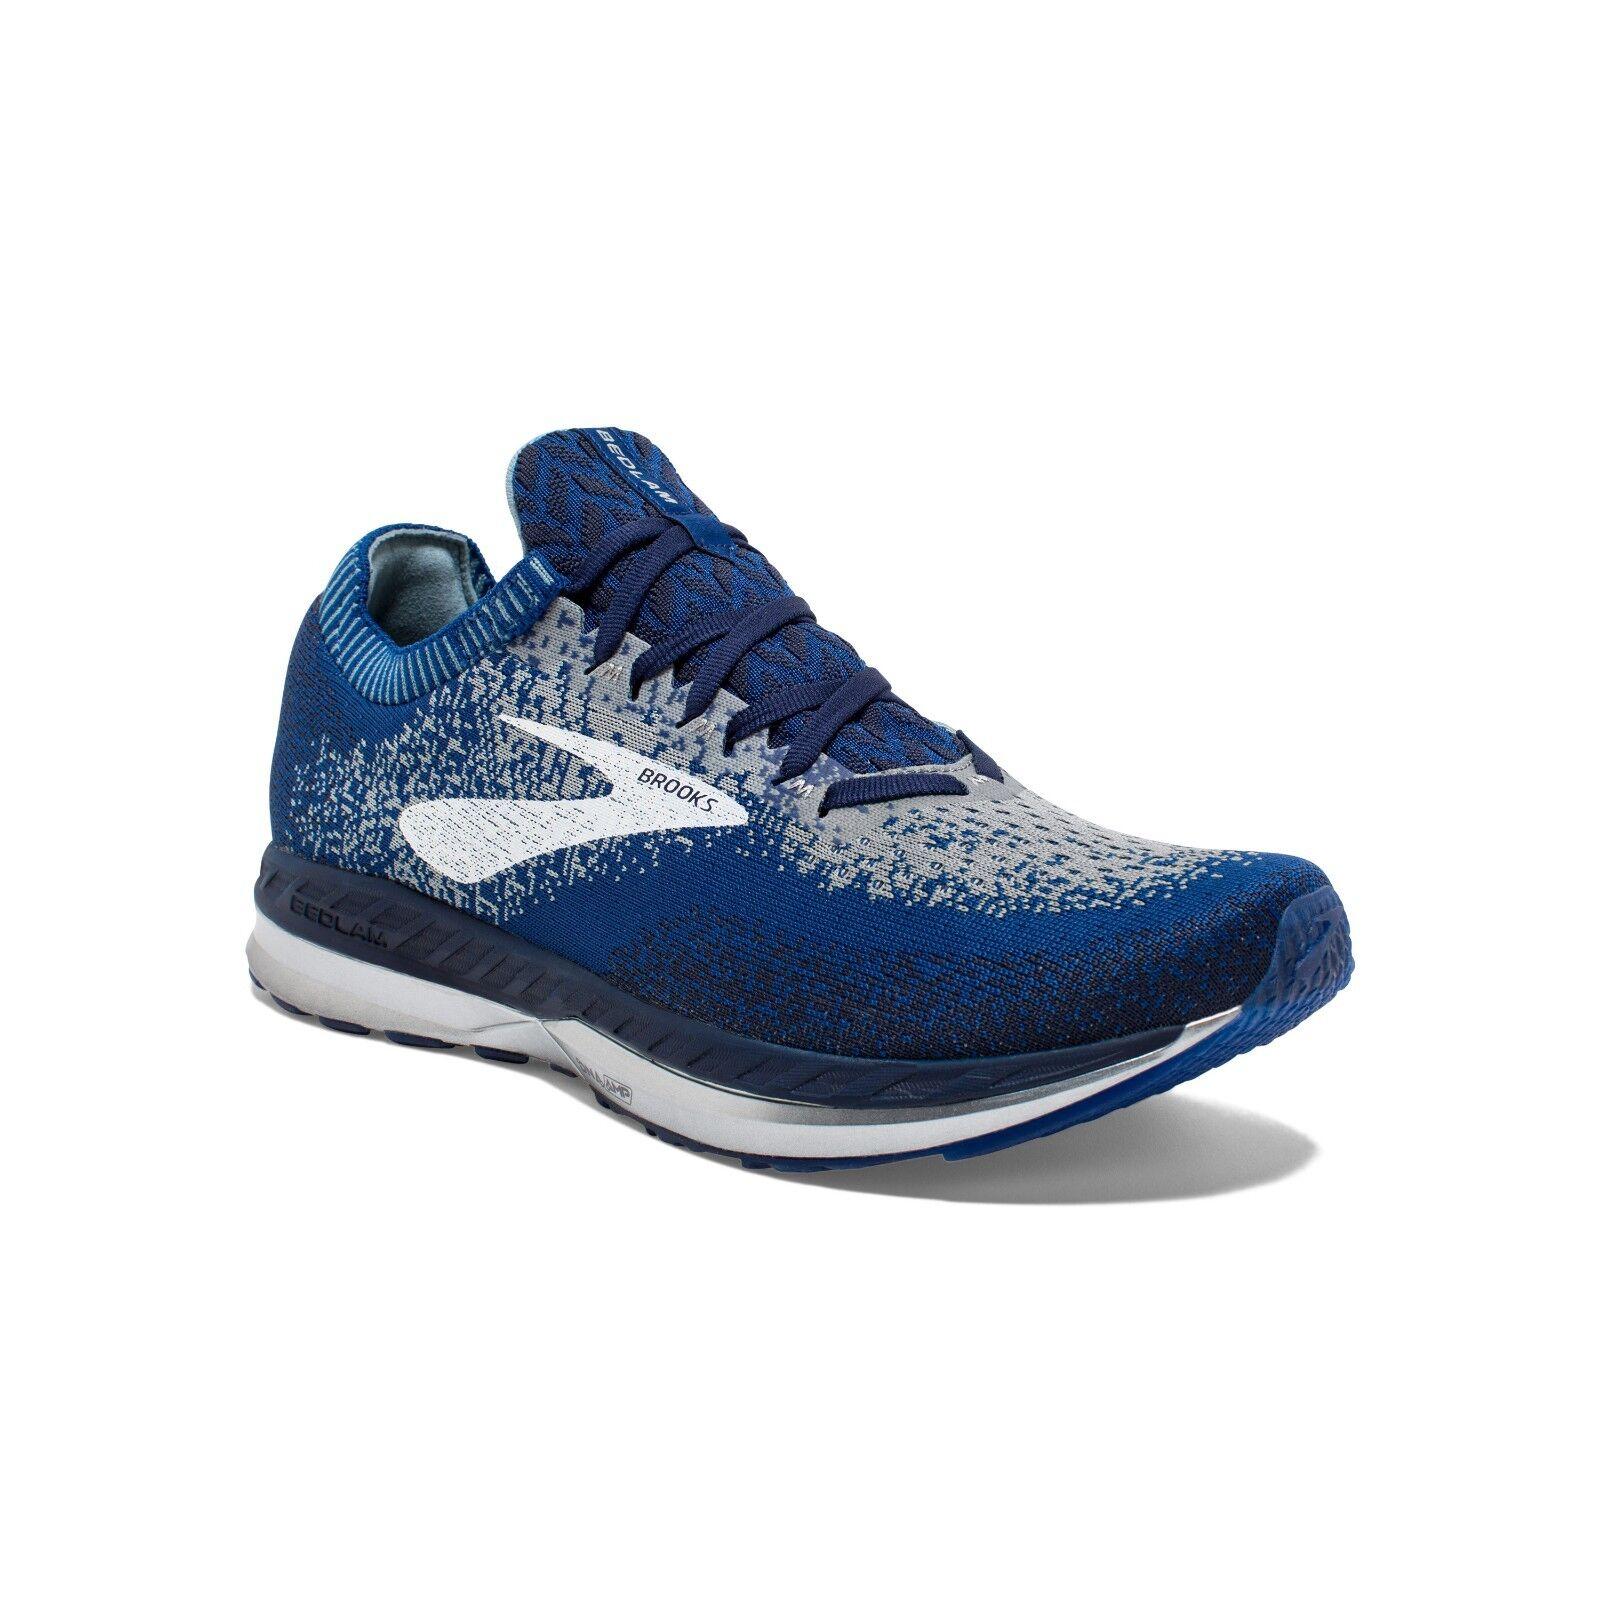 LATEST RELEASE Brooks Bedlam Mens Running shoes (D) (449)